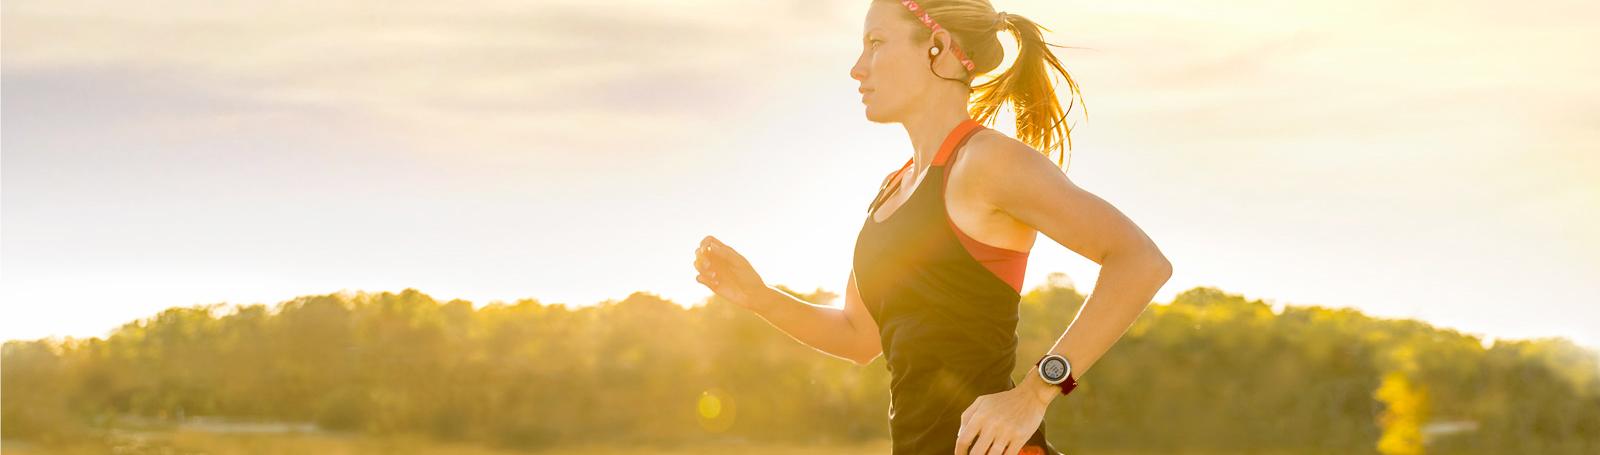 Garmin Woman Running